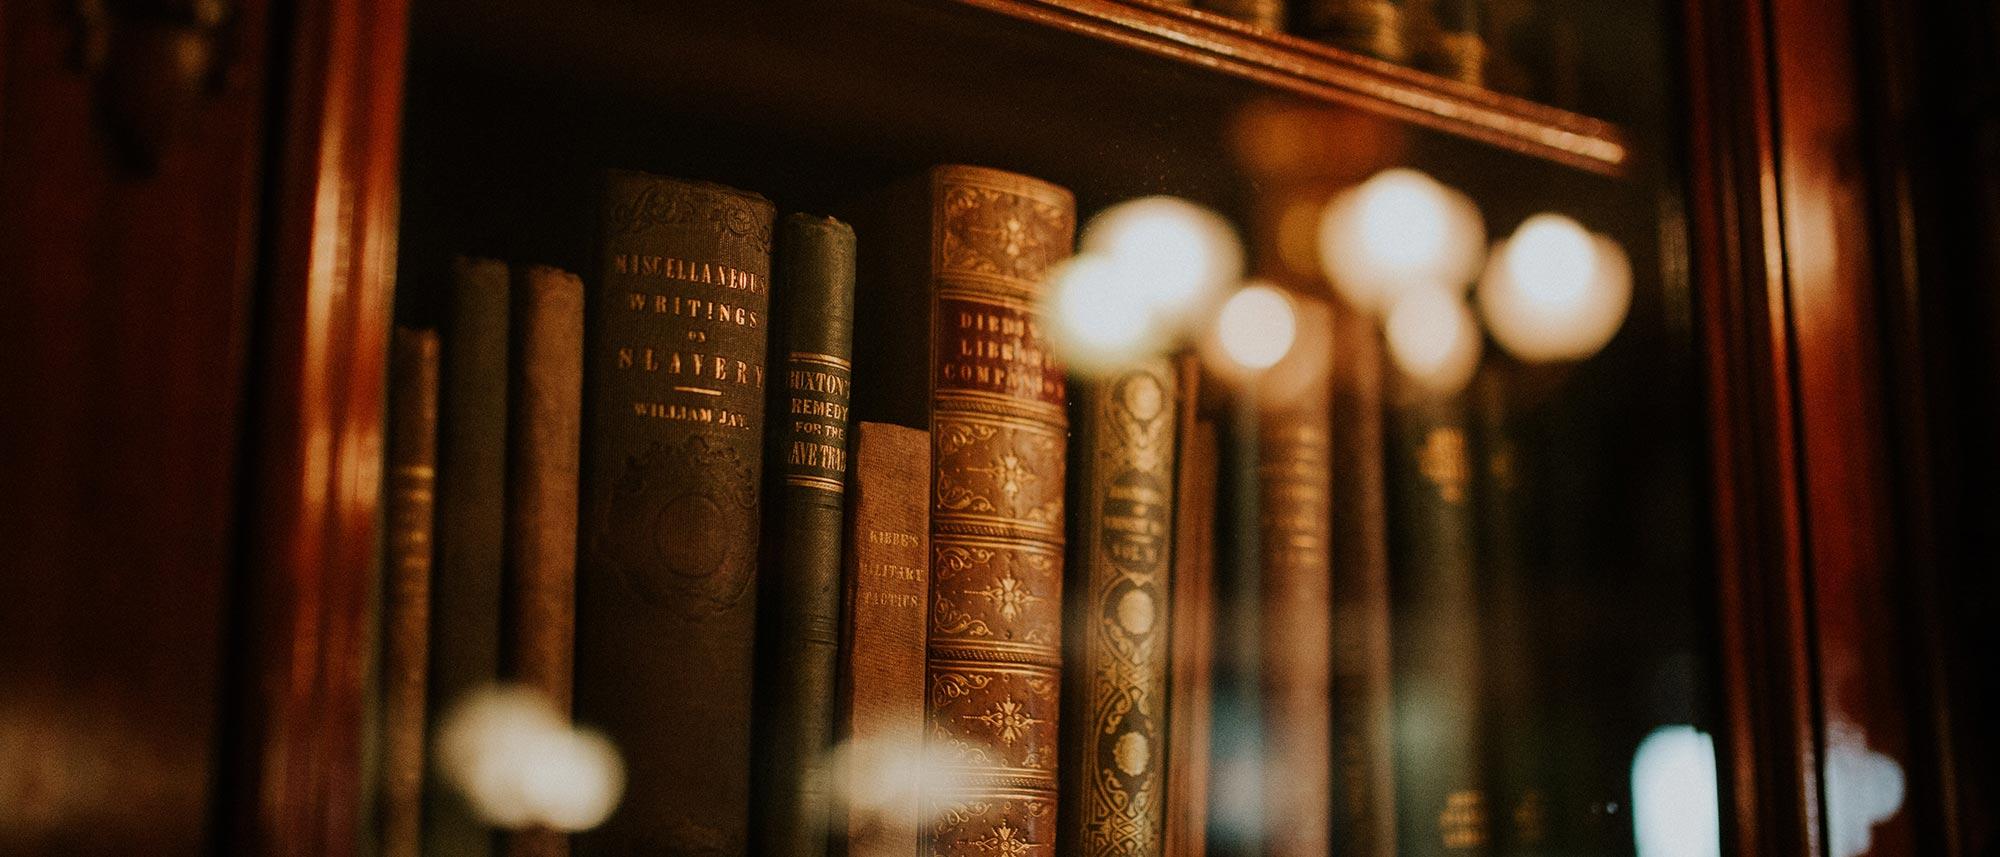 library of books on shelves